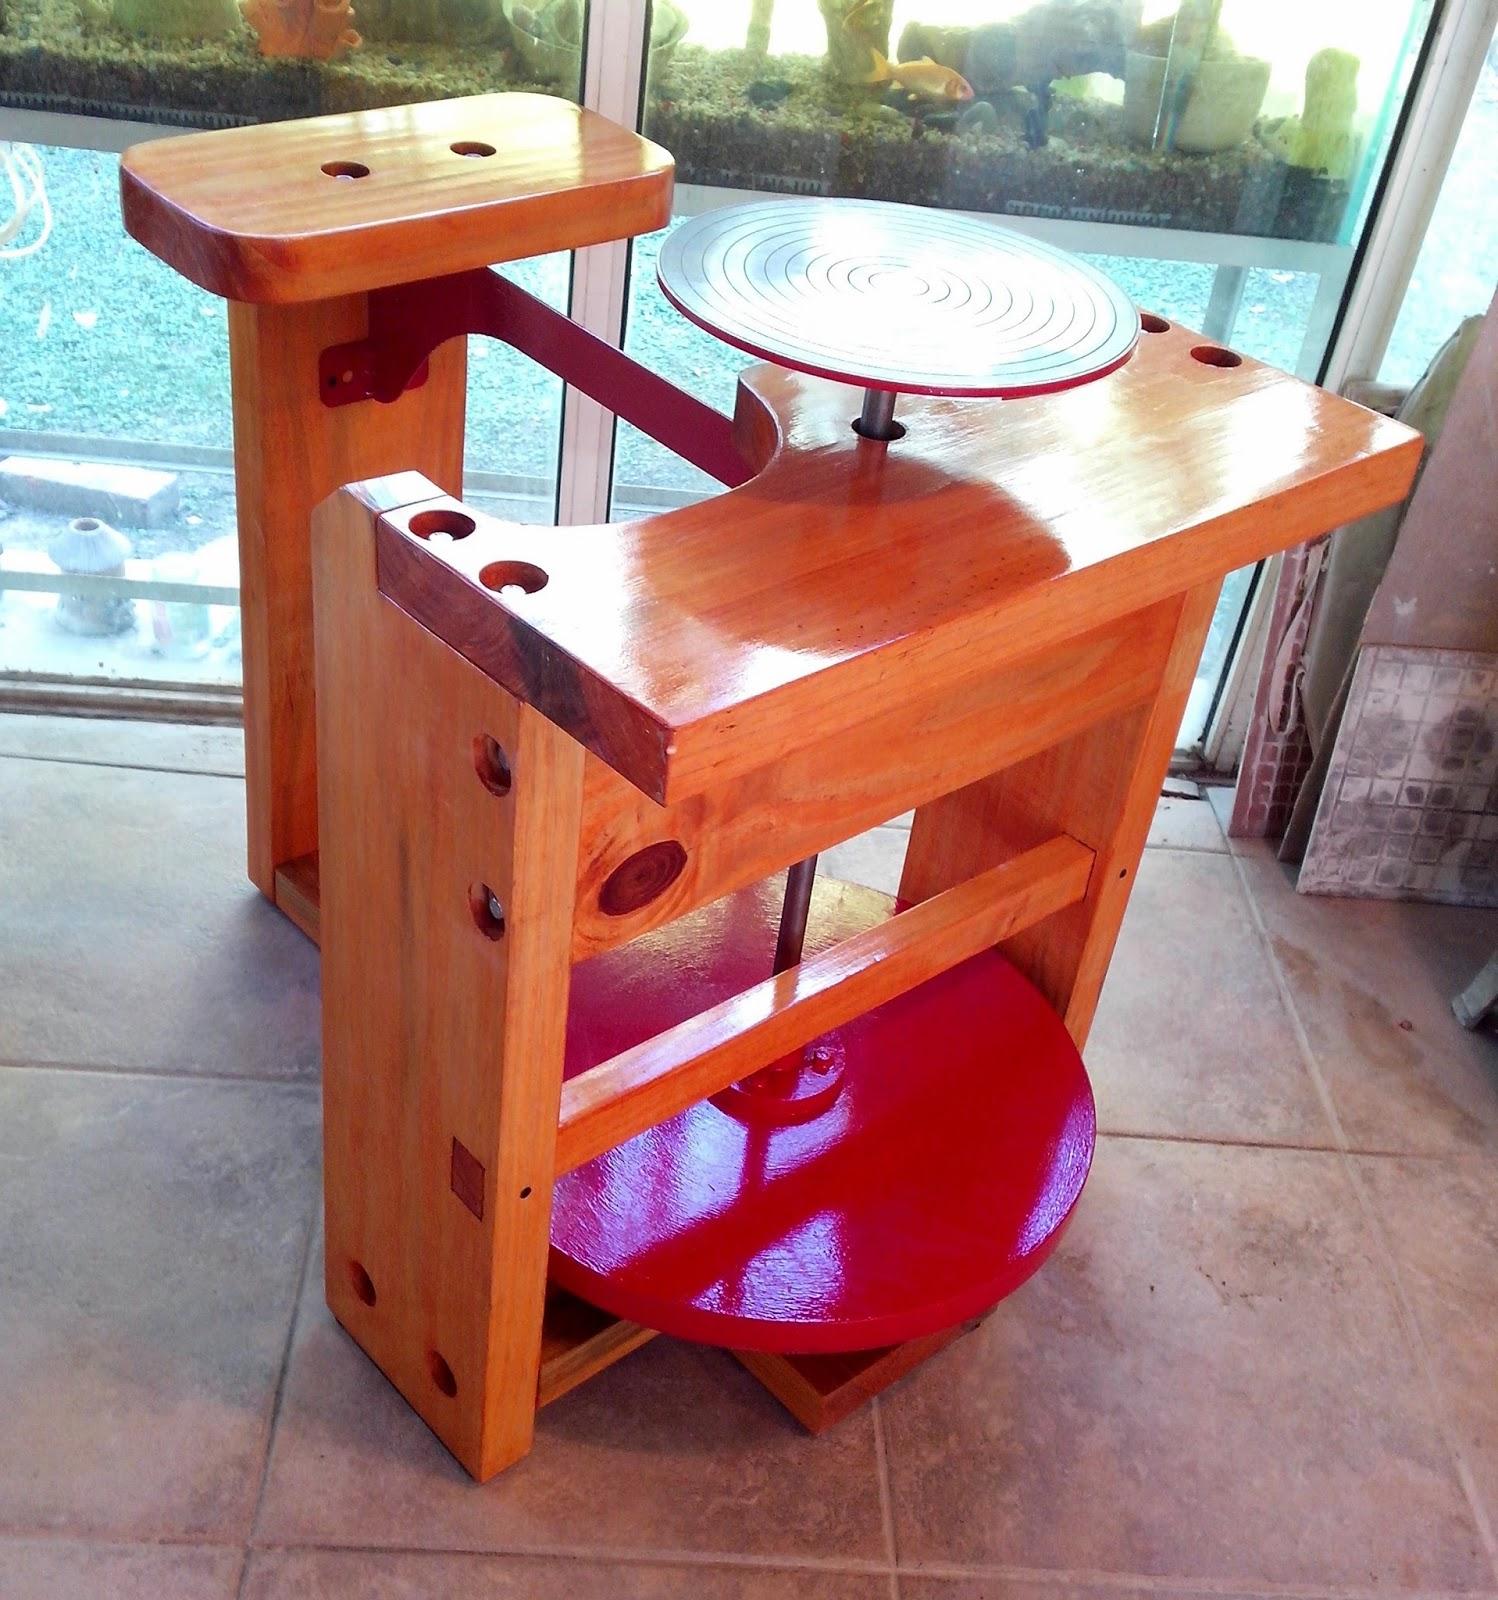 churlingham tools herramientas para ceramistas torno